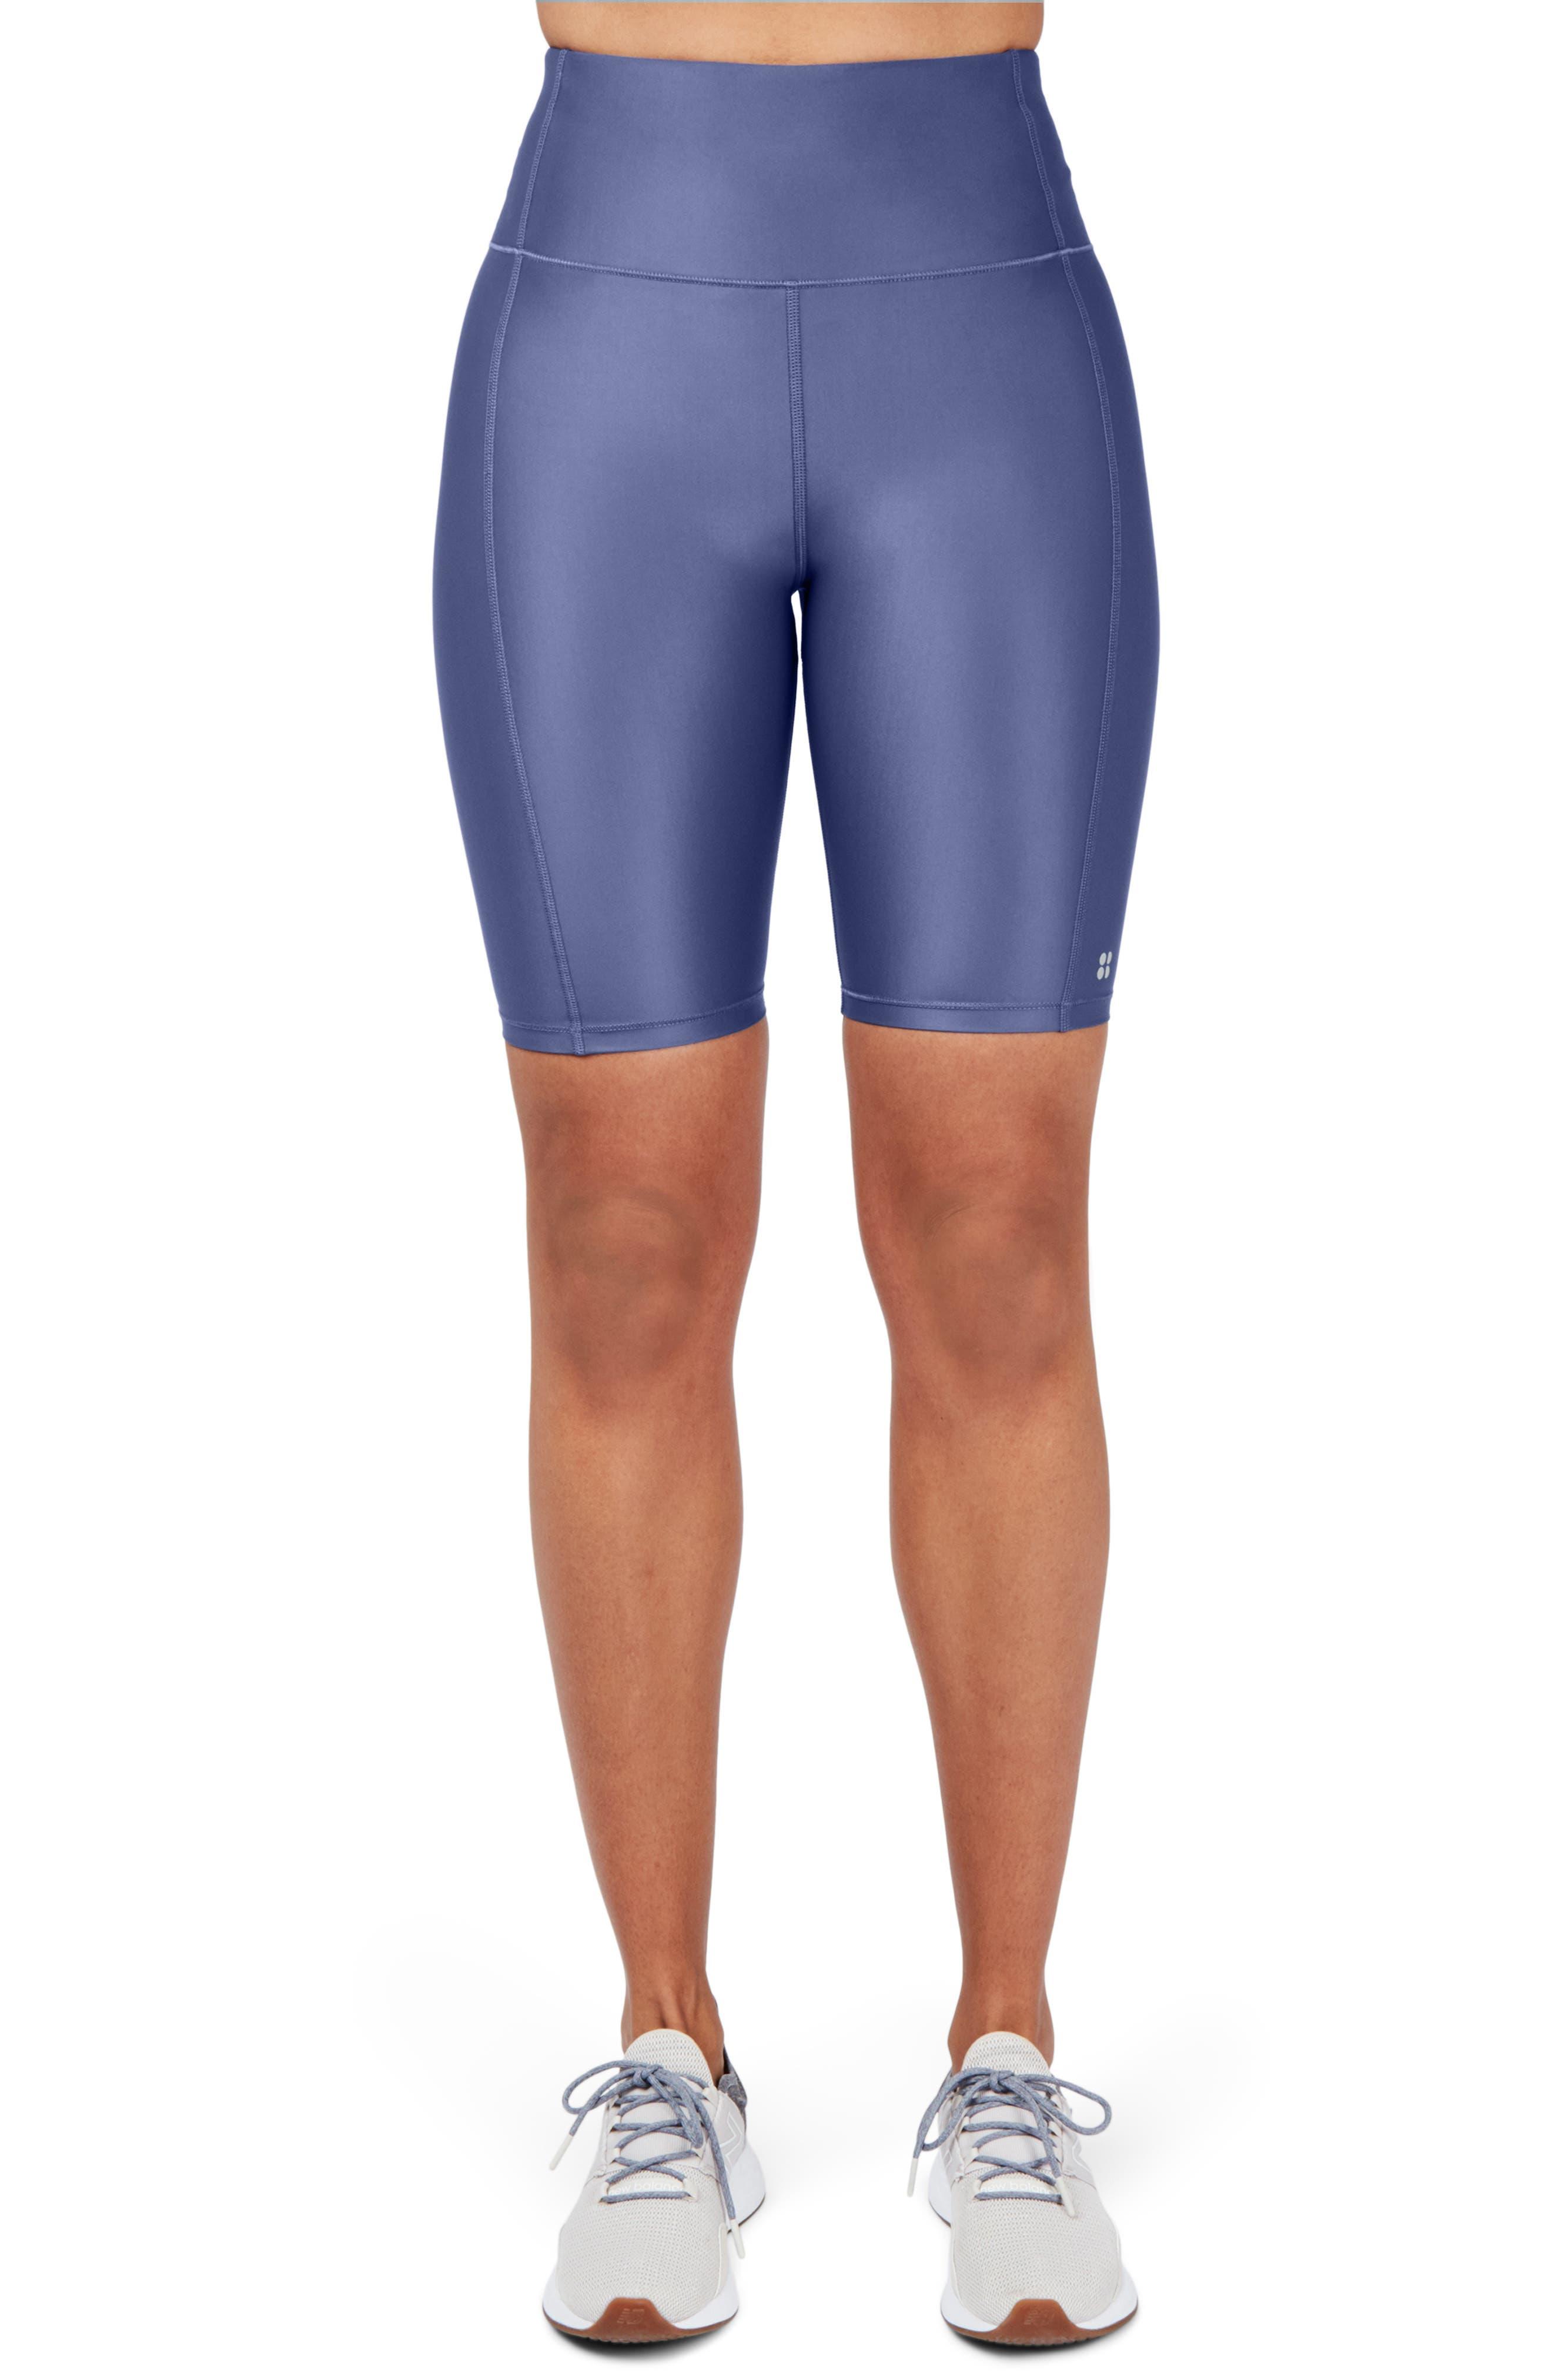 Sweaty Betty Women's Sweaty Betty High Shine Bike Shorts